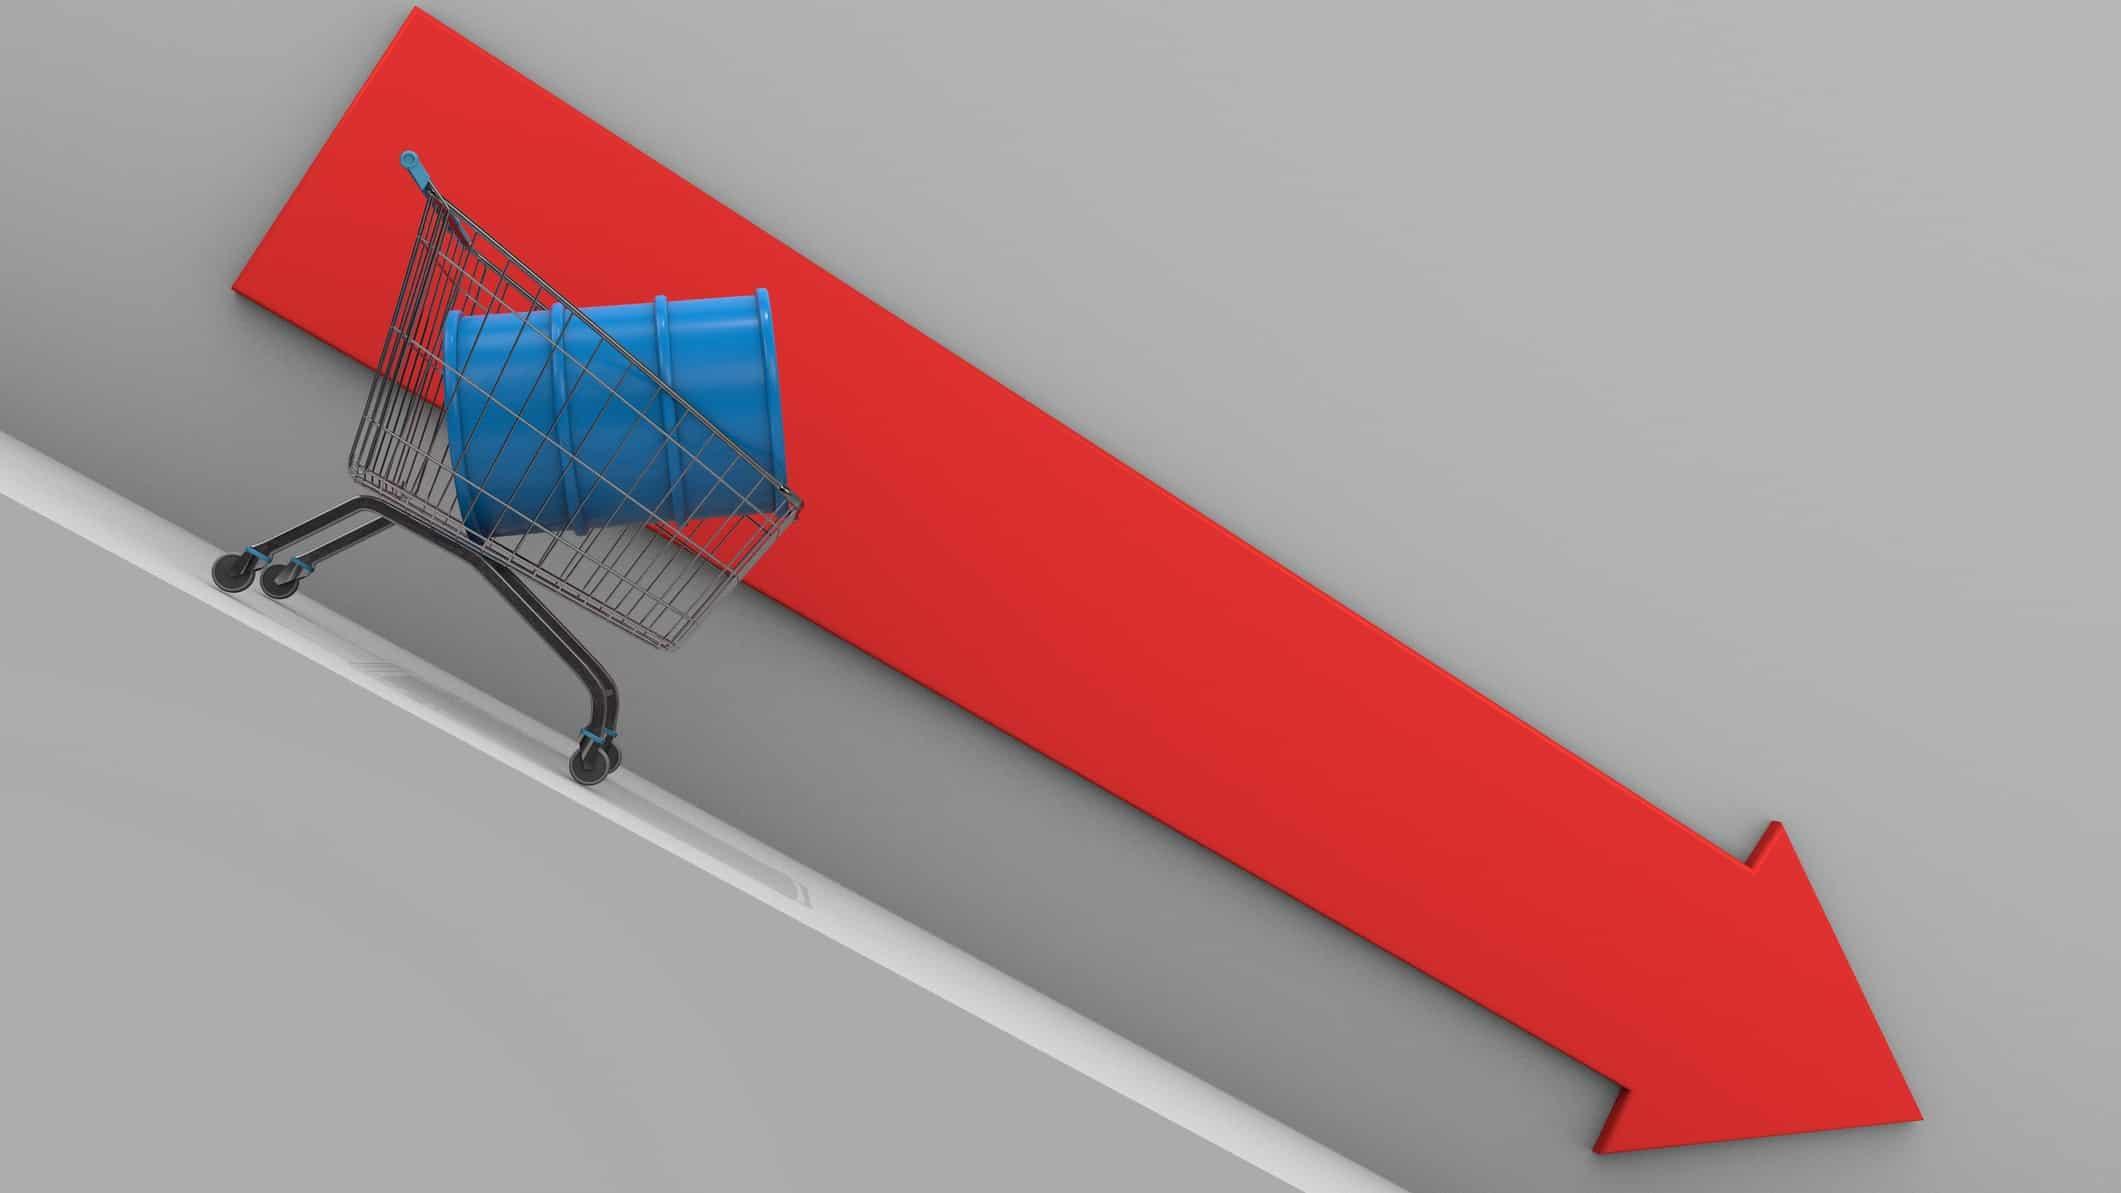 barrel of oil in a shopping trolley sliding down red arrow representing OPEC+ split ASX energy stocks